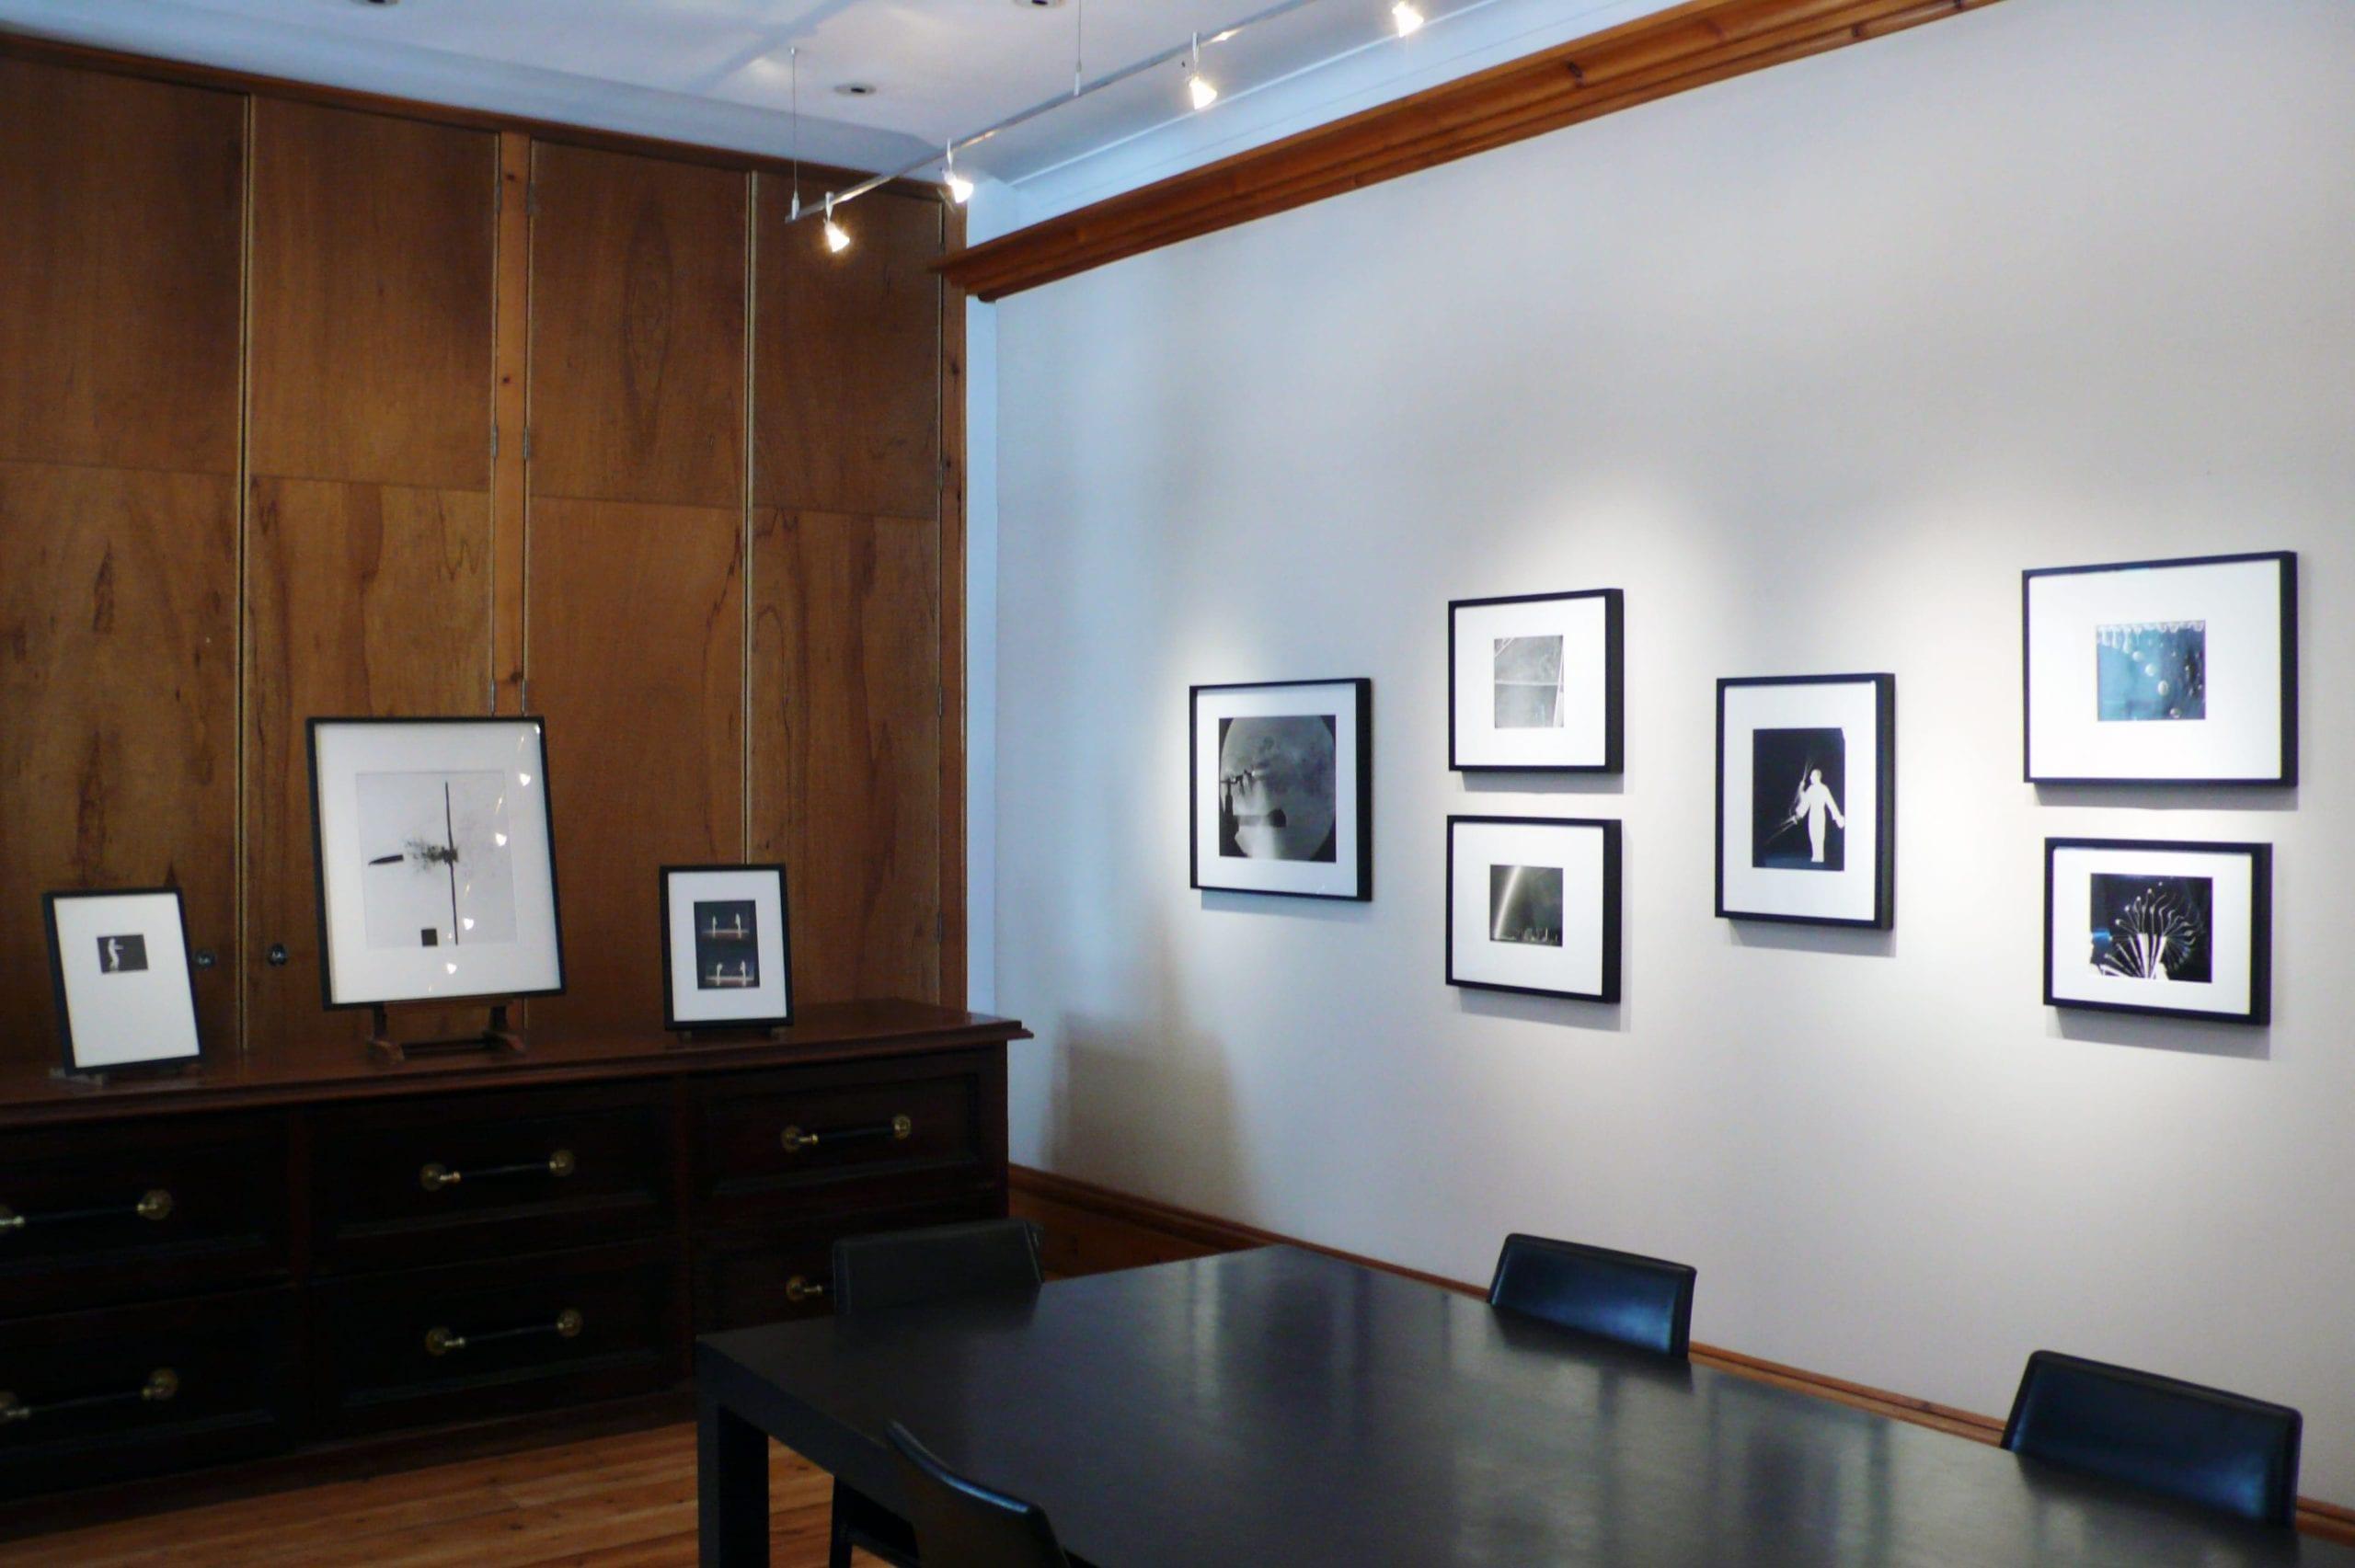 Michael Hoppen's gallery goes online